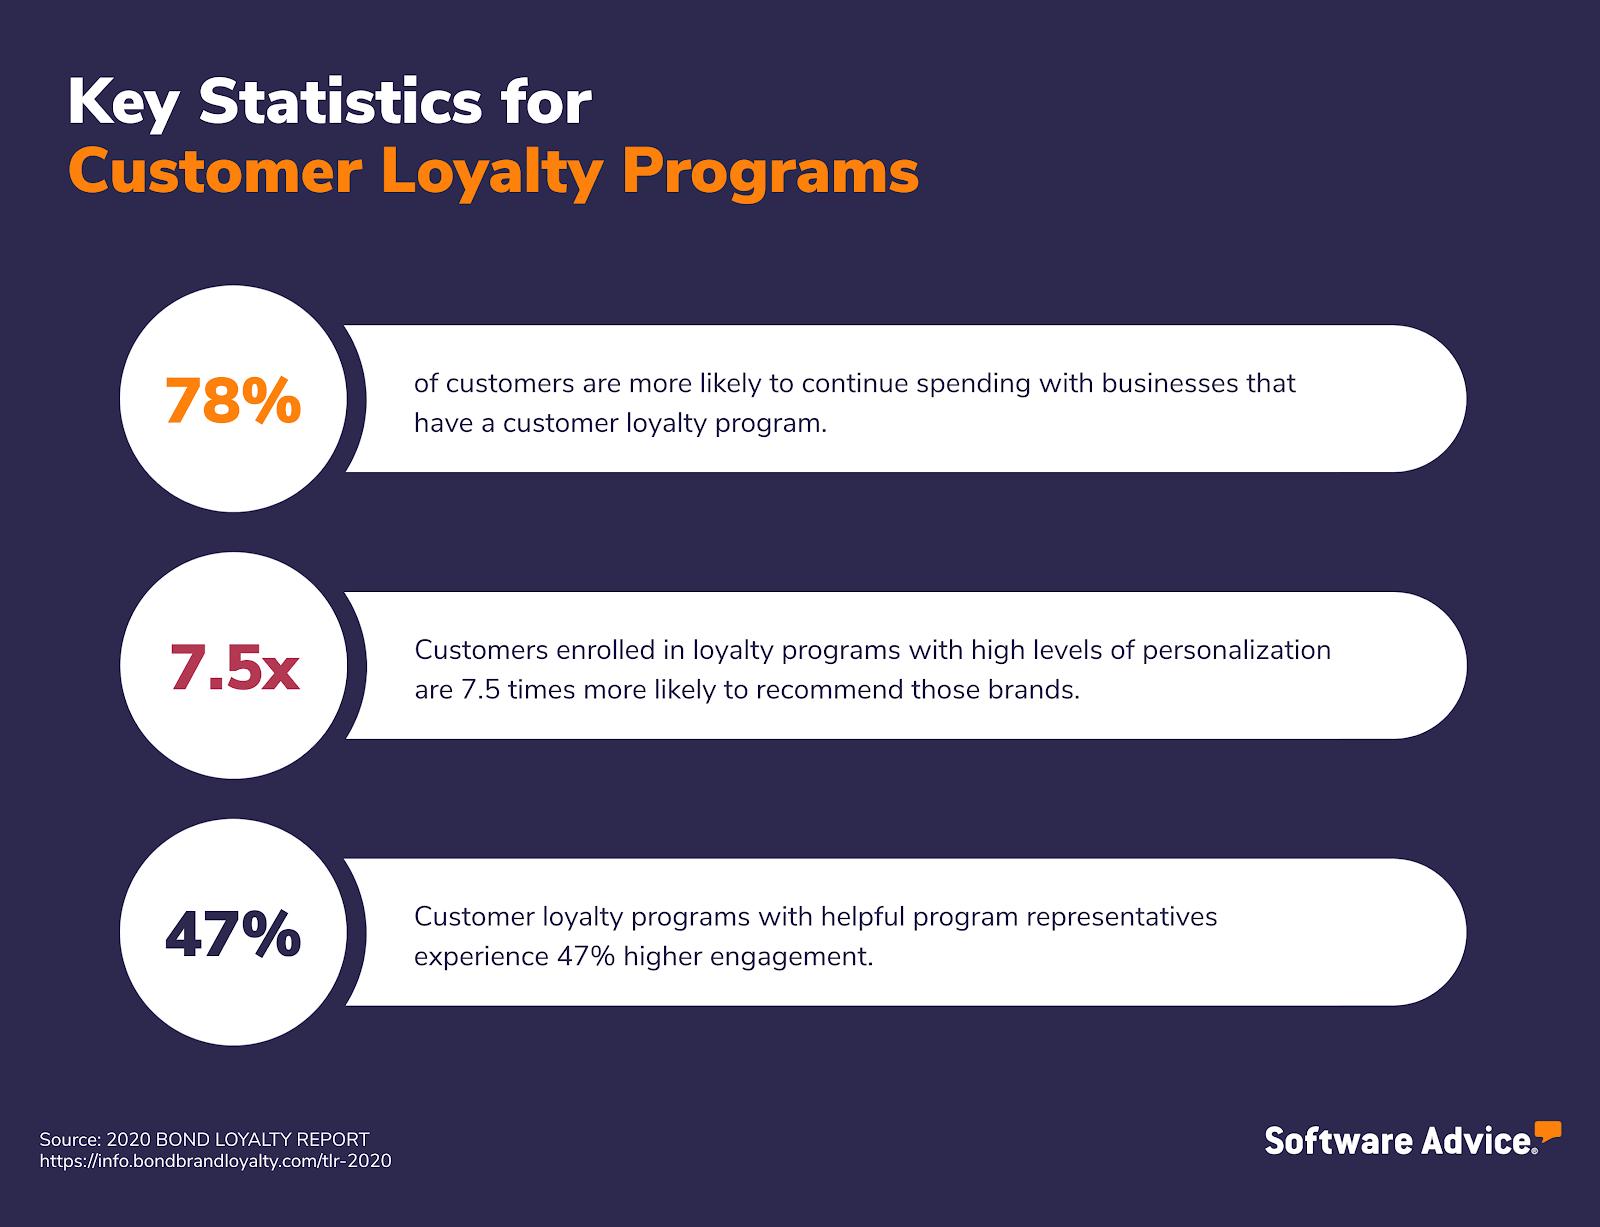 Key Statistics for Customer Loyalty Programs